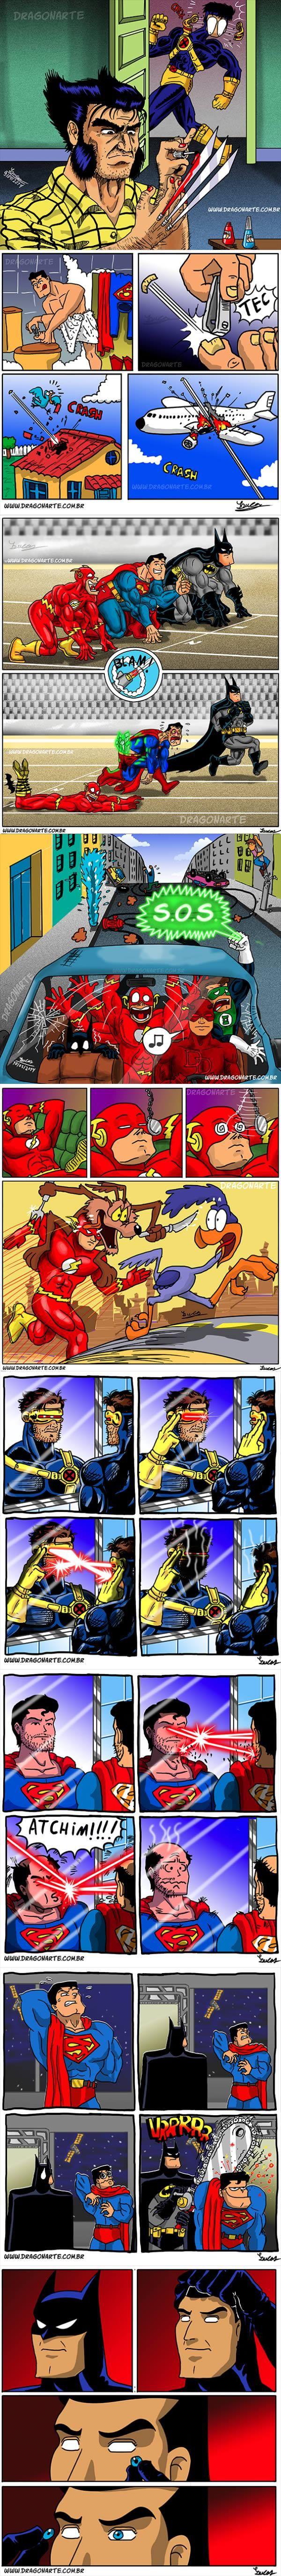 These Superhero Comics That'll Make You Laugh So Hard You'll Cry.